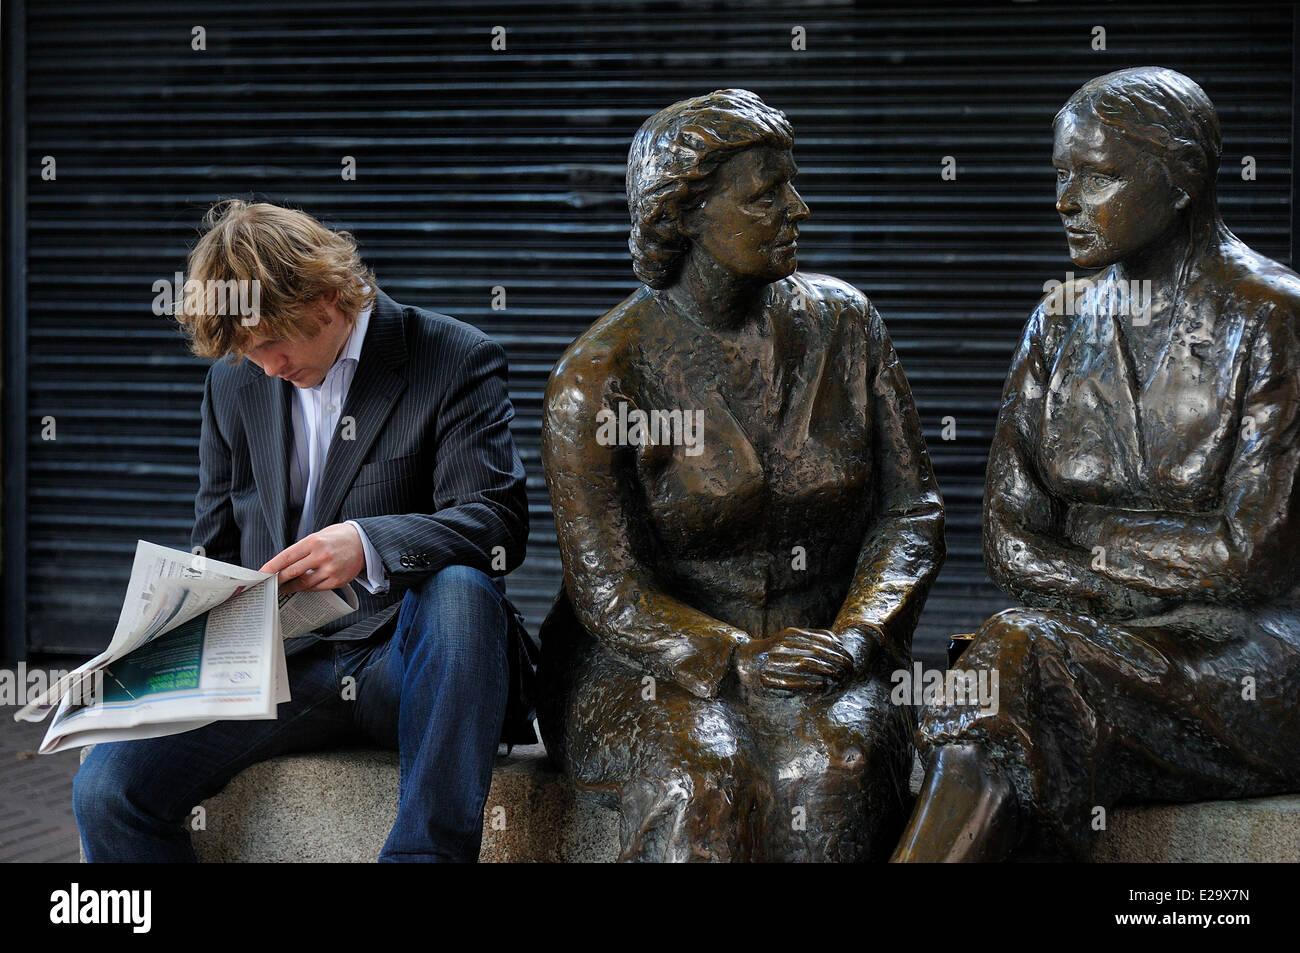 Ireland, Dublin, Lower Liffey Street - Stock Image